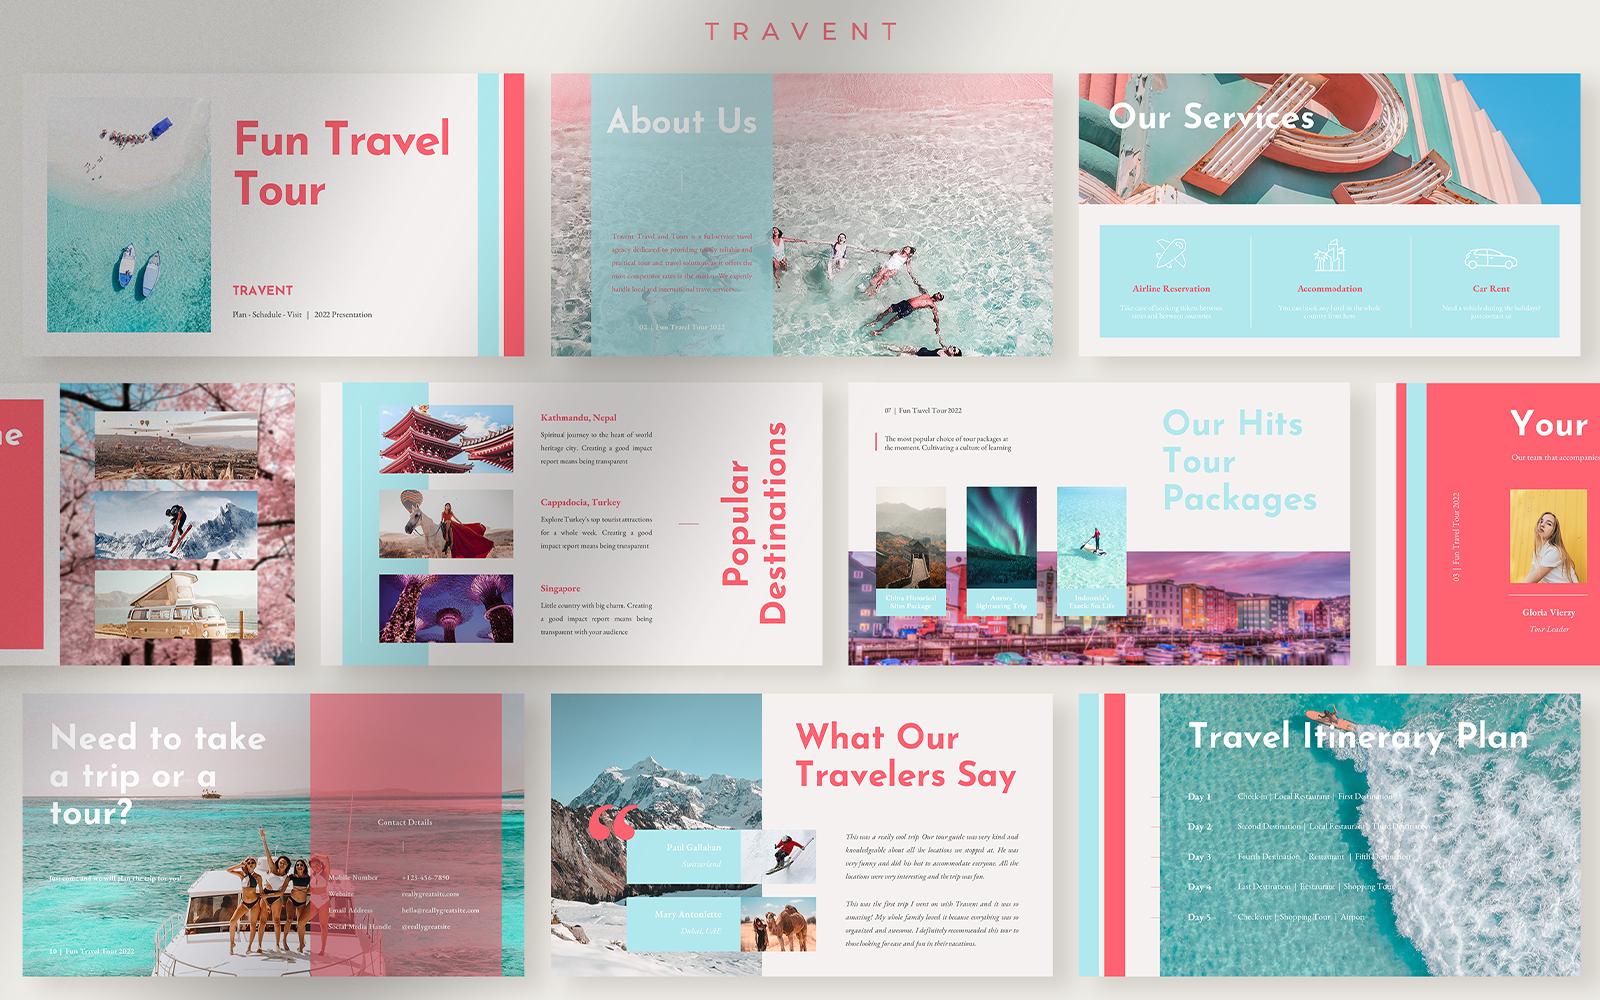 Travent - Refreshing Fun Travel Tour Presentation